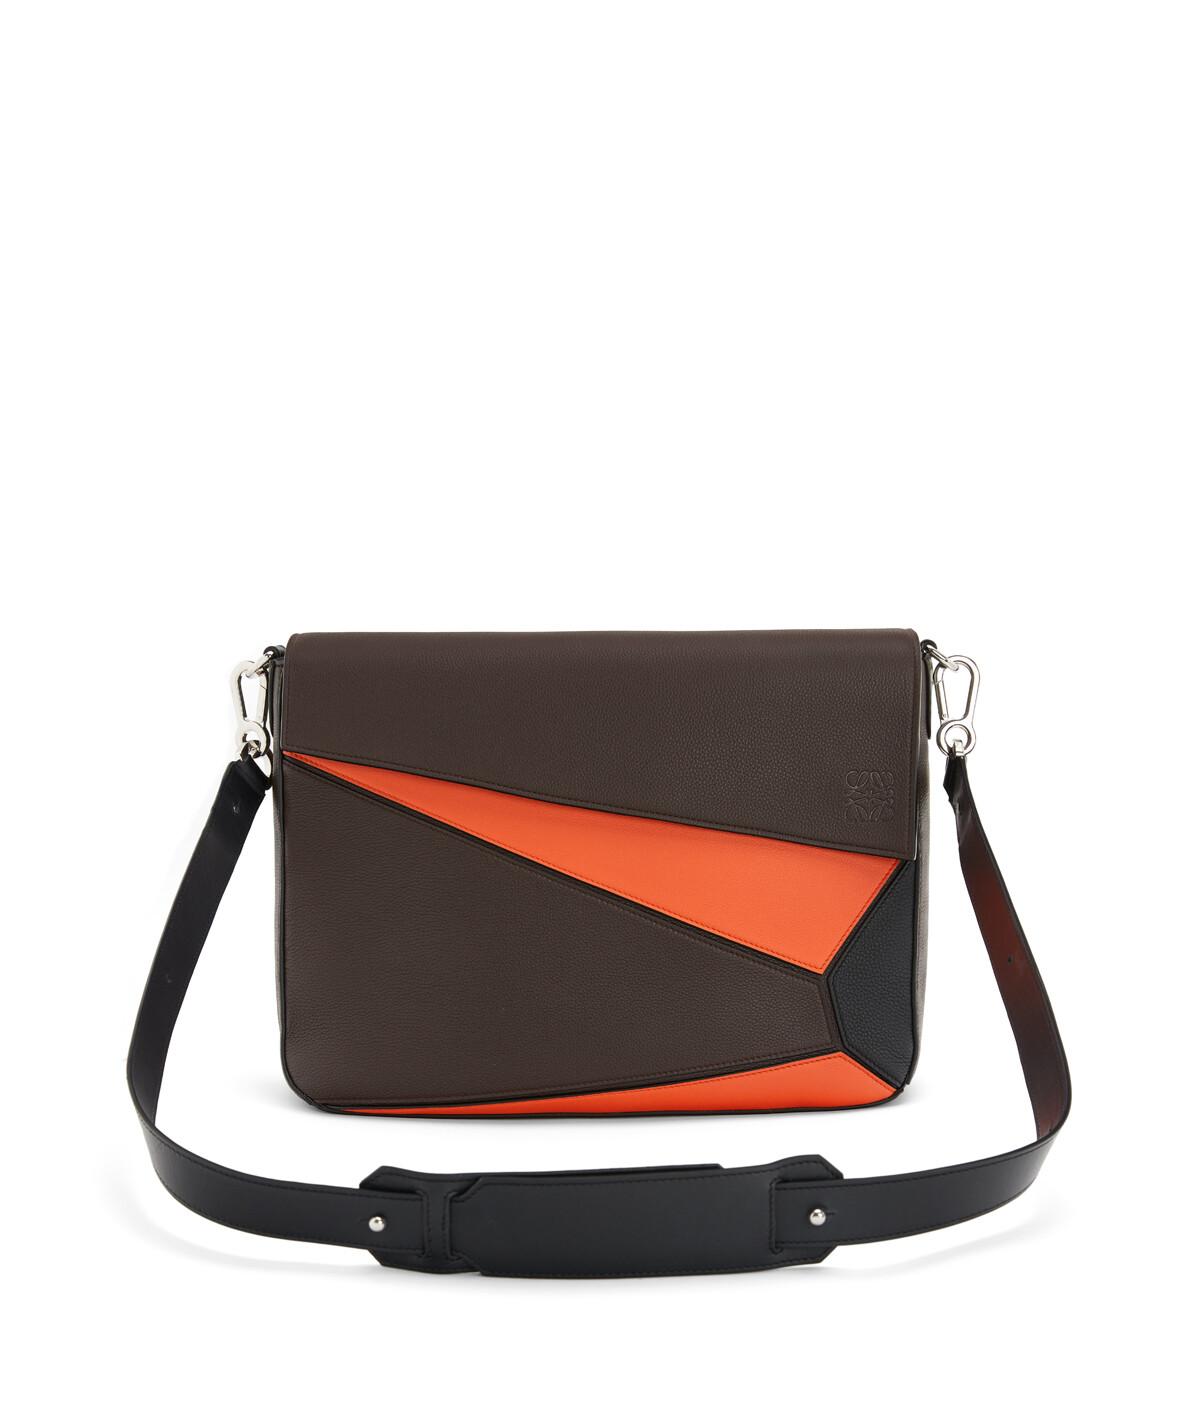 LOEWE Puzzle Messenger Bag Chocolate Brown/Orange front